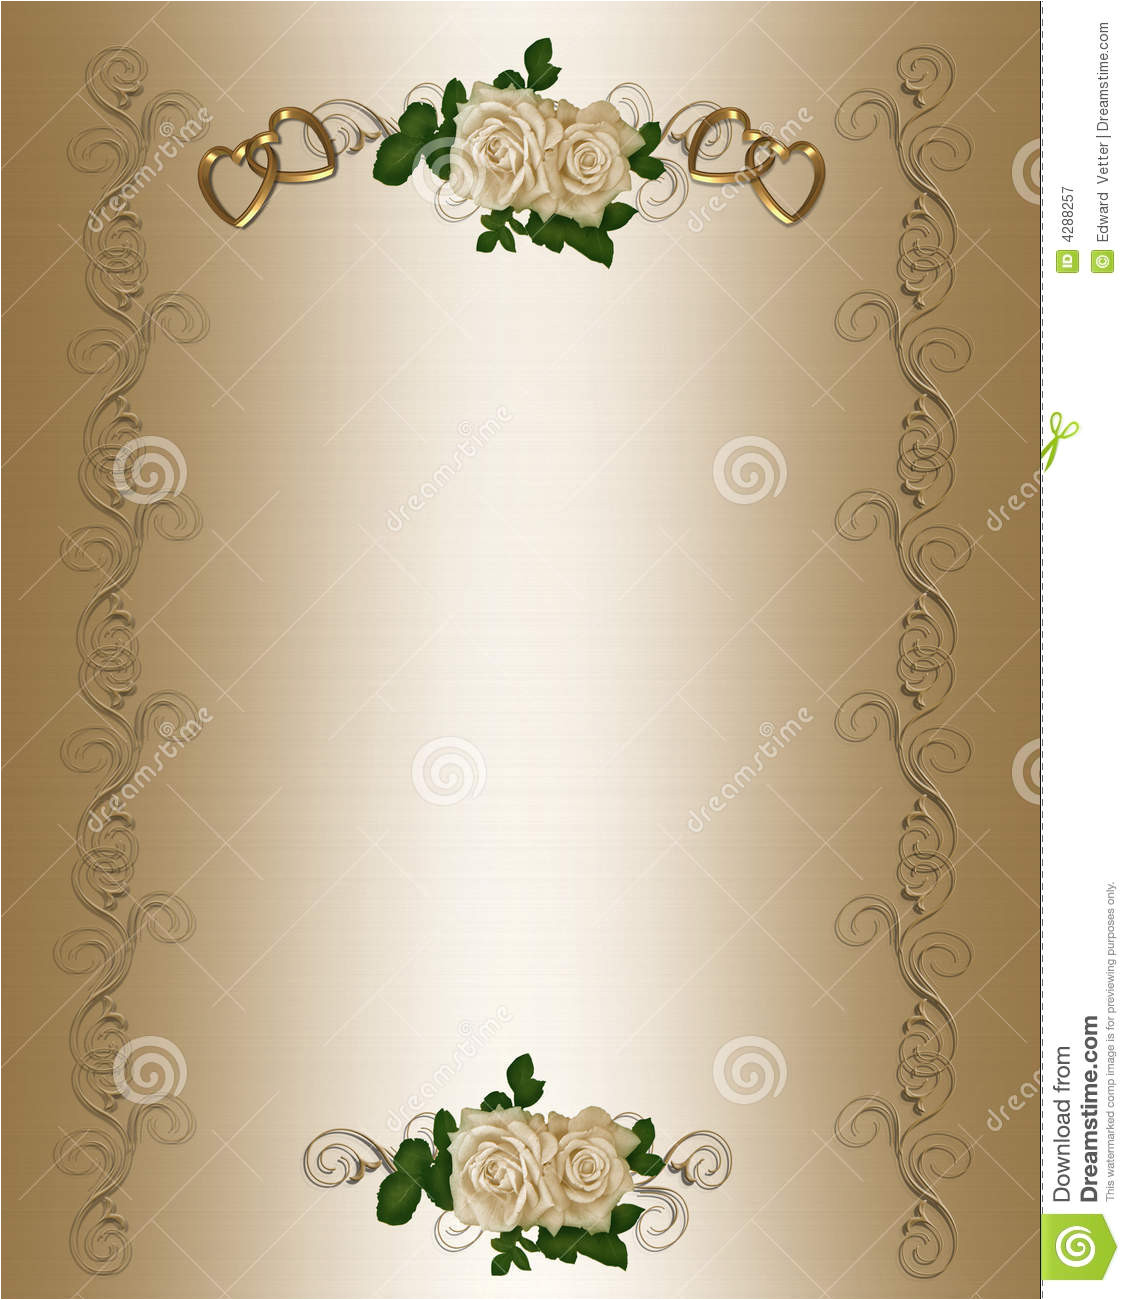 royalty free stock photography wedding invitation template image4288257